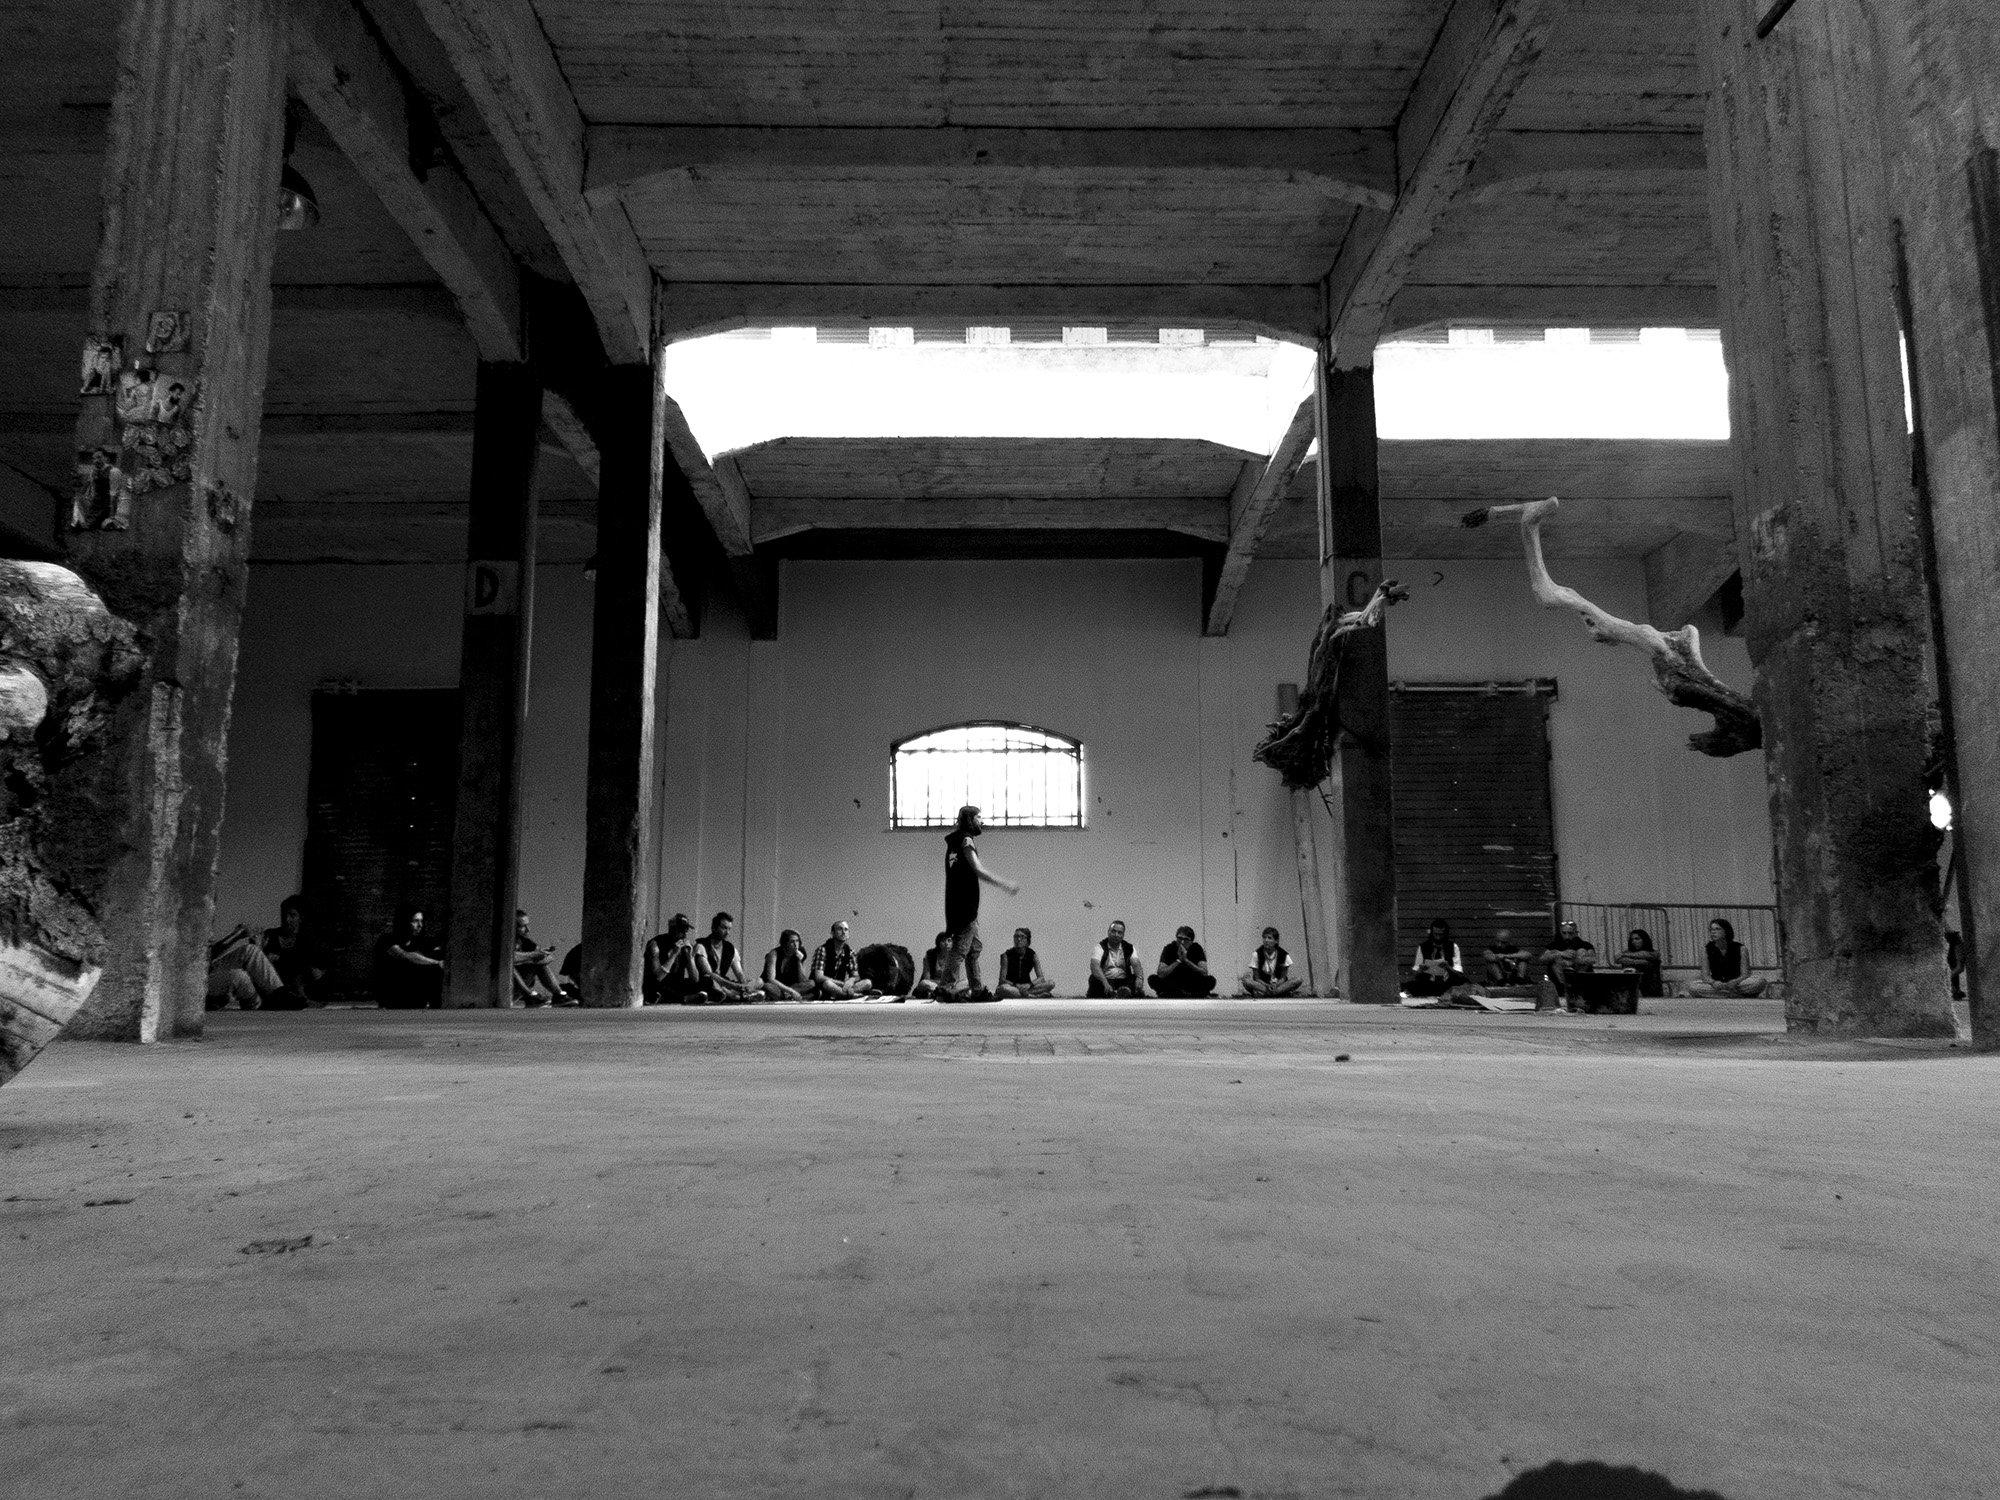 La Leggenda di Parsifal - La tavola rotonda. Foto: A. Buccella